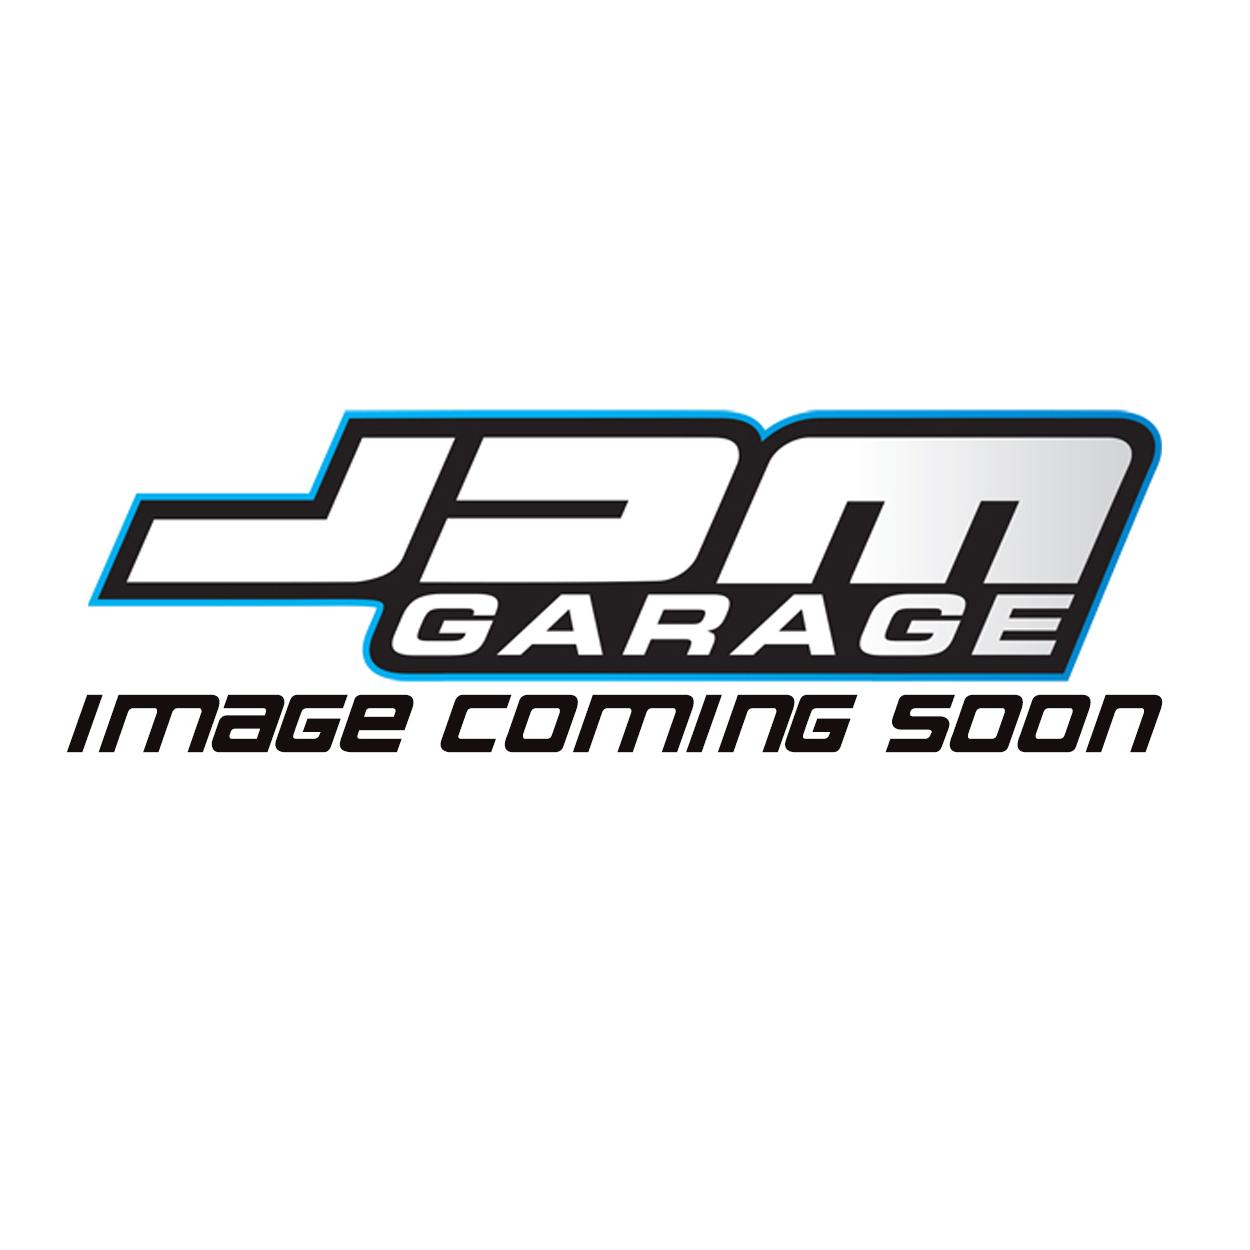 Tomei Forged Piston Oil Filler Cap Fits Nissan Skyline R32 R33 GTST R34 GTT GTR Silvia S13 S14 S15 Laurel C33 C34 C35 Stagea WC34